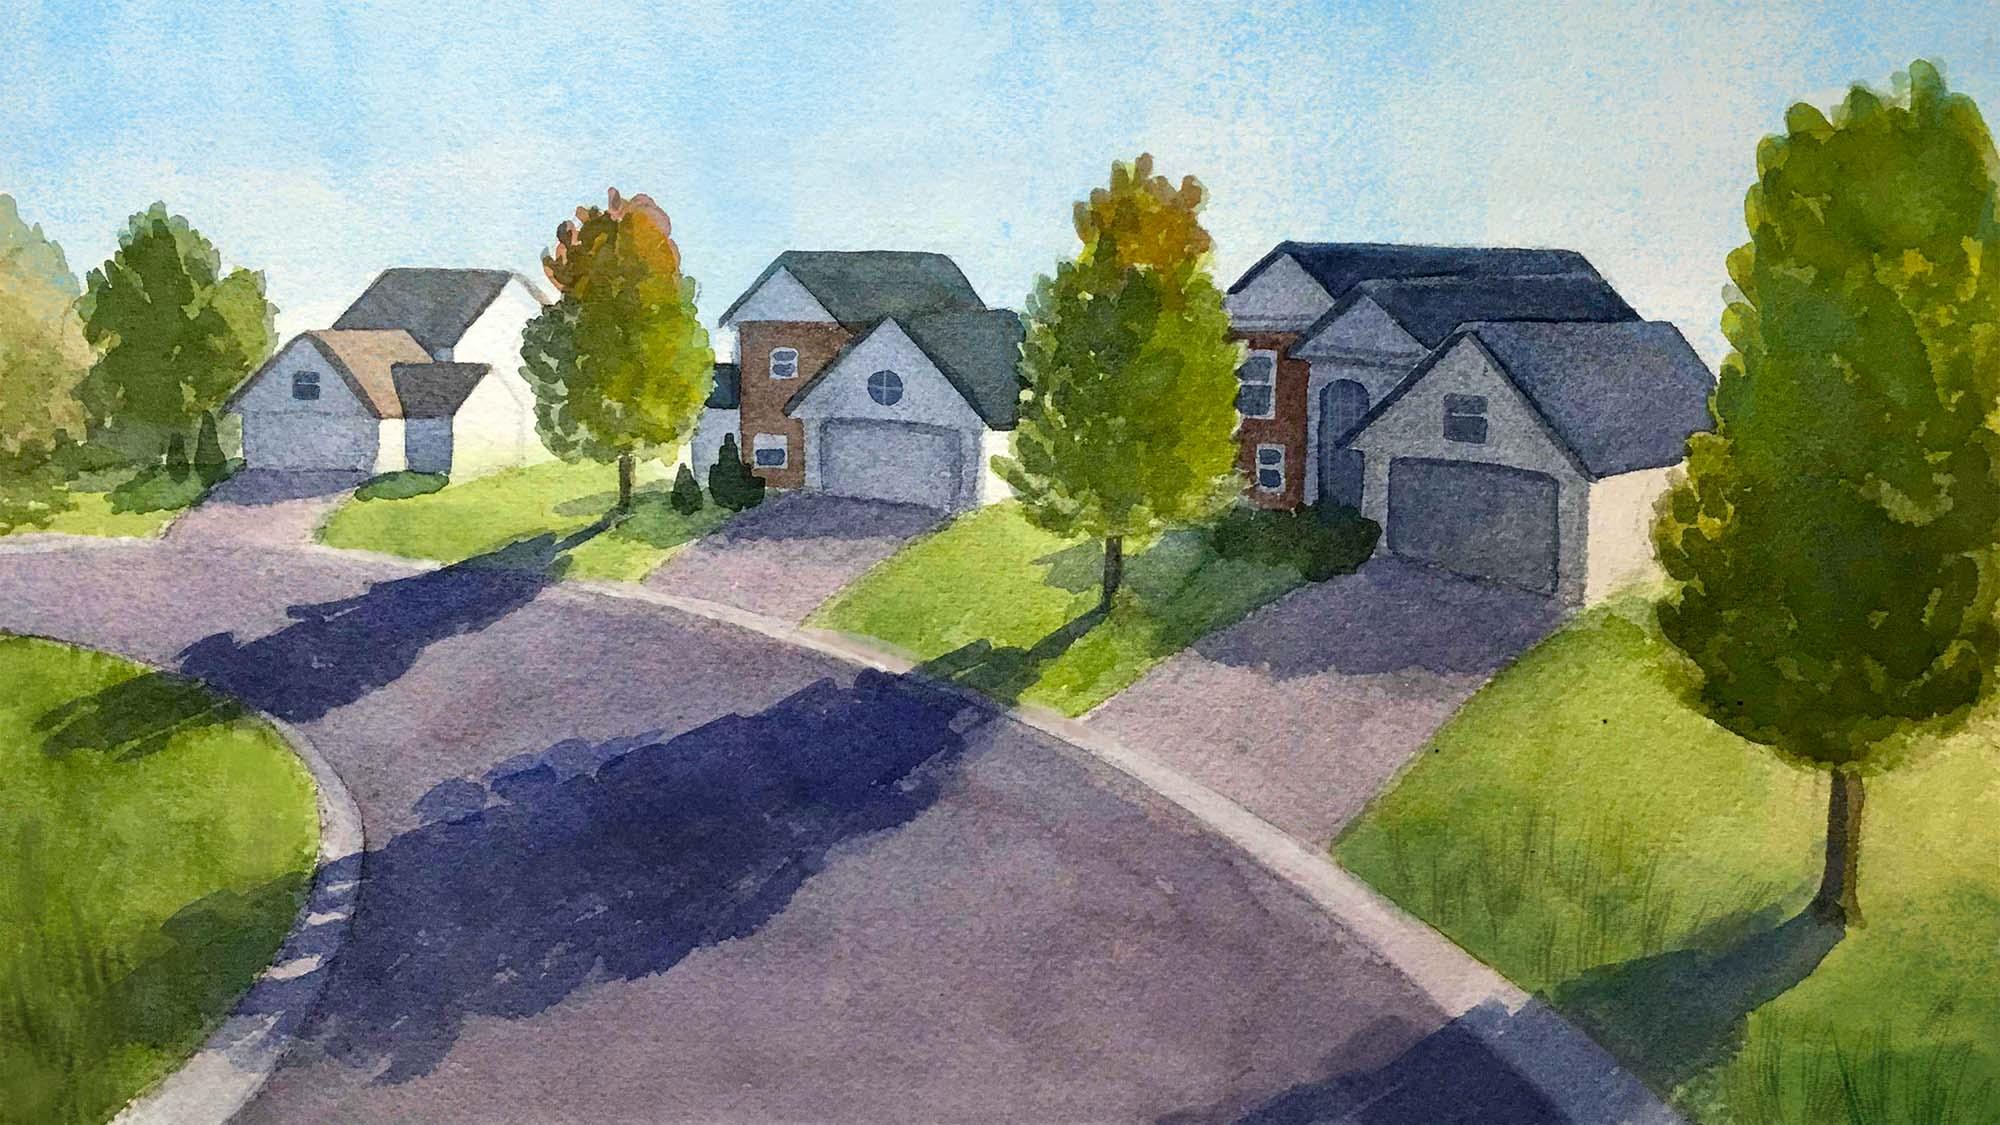 Painting of suburban street